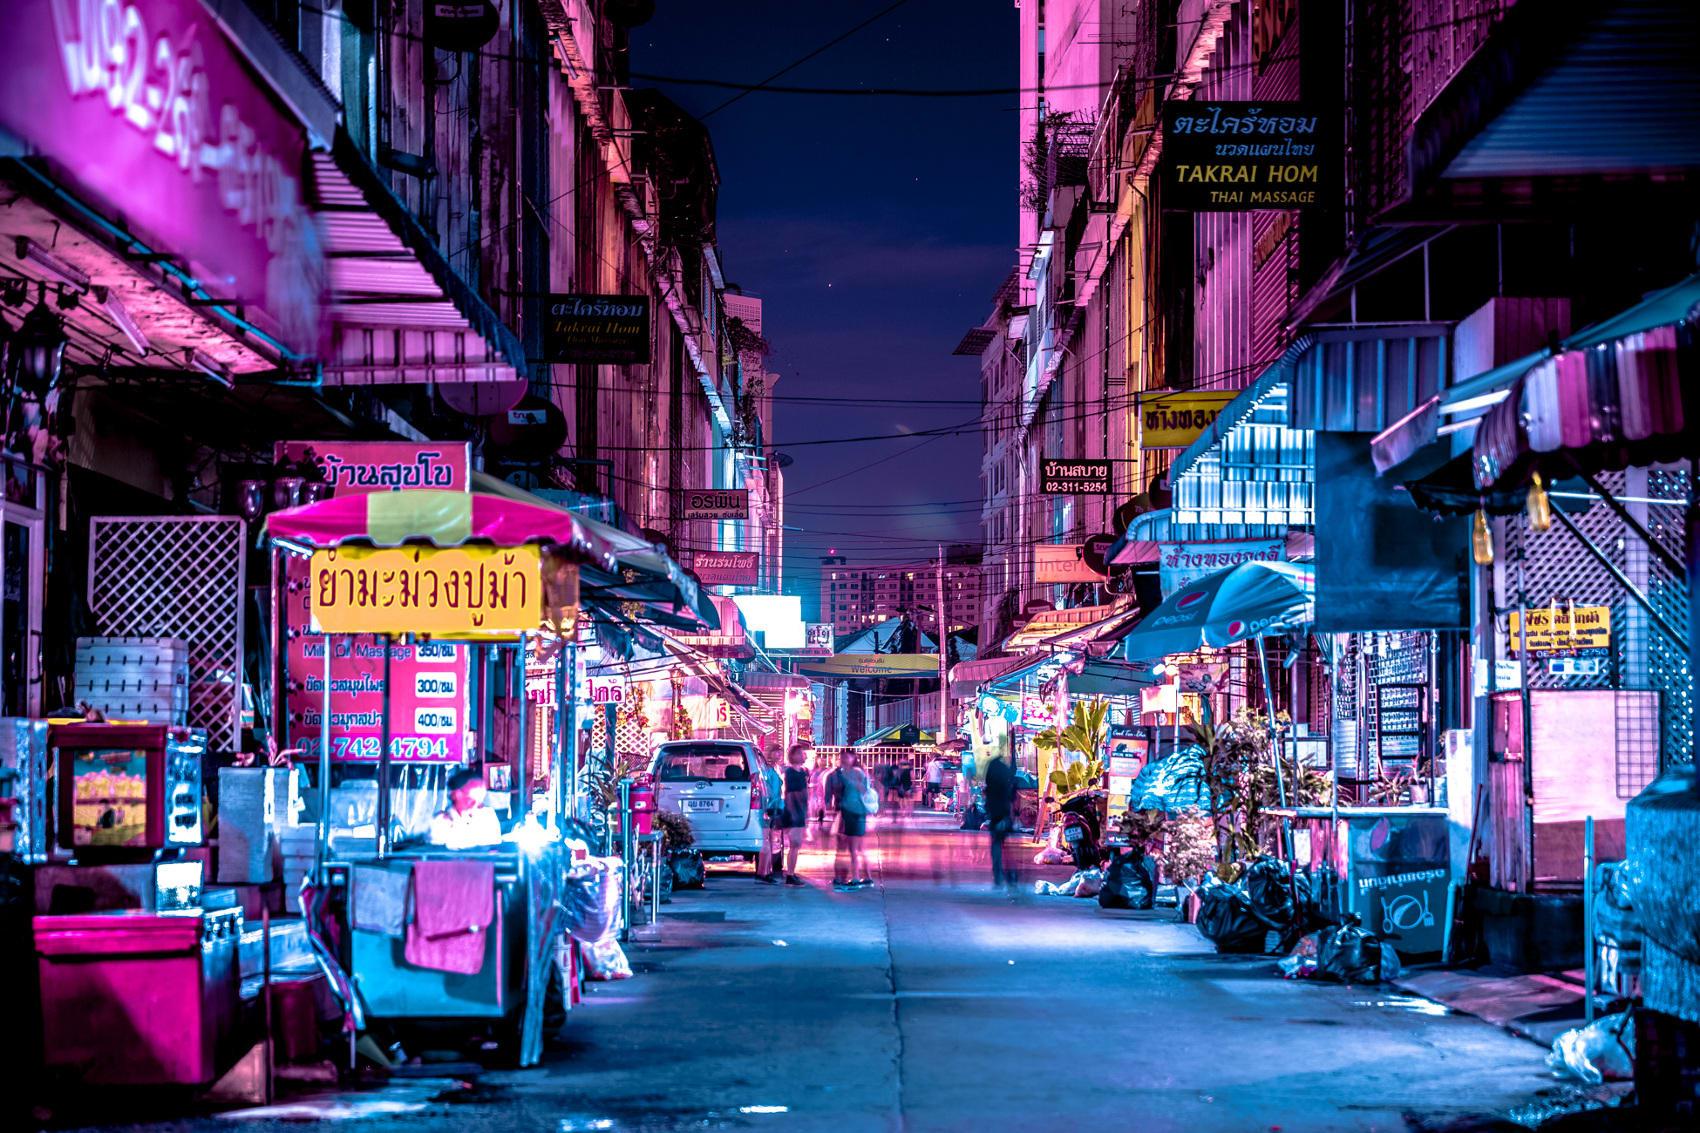 泰國曼谷,圖片取自www.lonelyplanet.com。